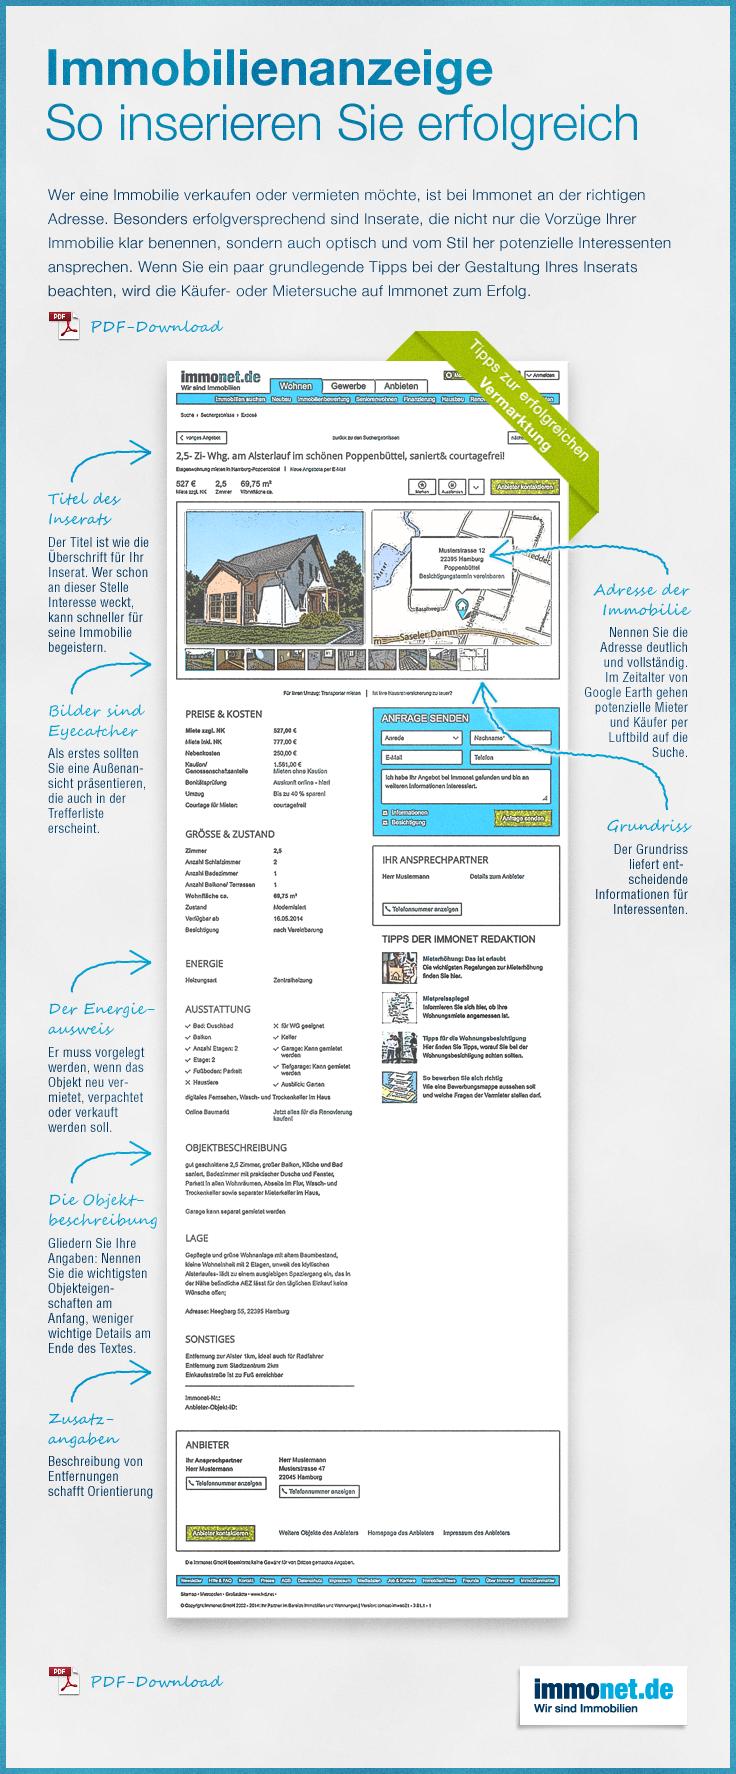 Hier Http Www Immonet De Service Checkliste Immobilienanzeige Html